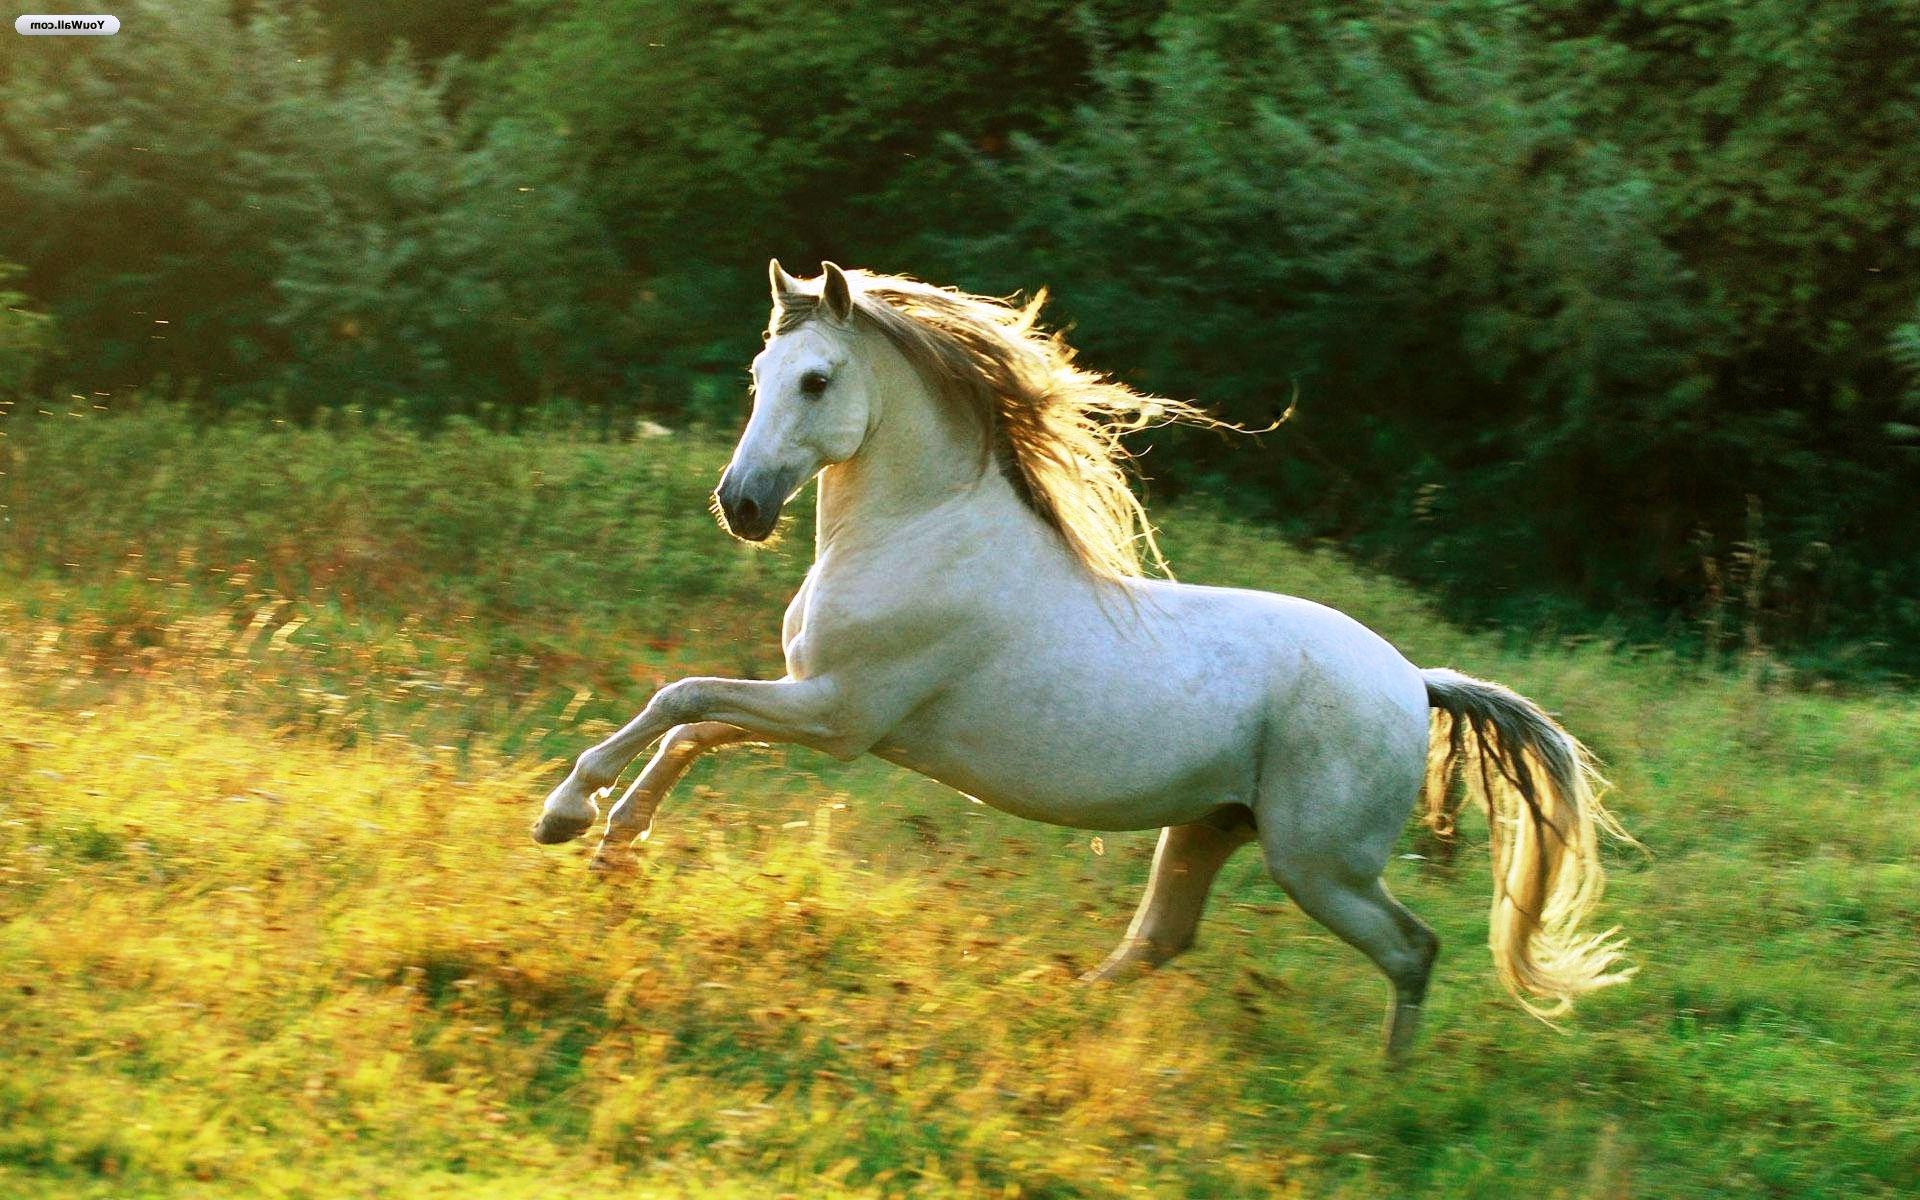 Horse In White Hd 1920x1200 Wallpaper Teahub Io